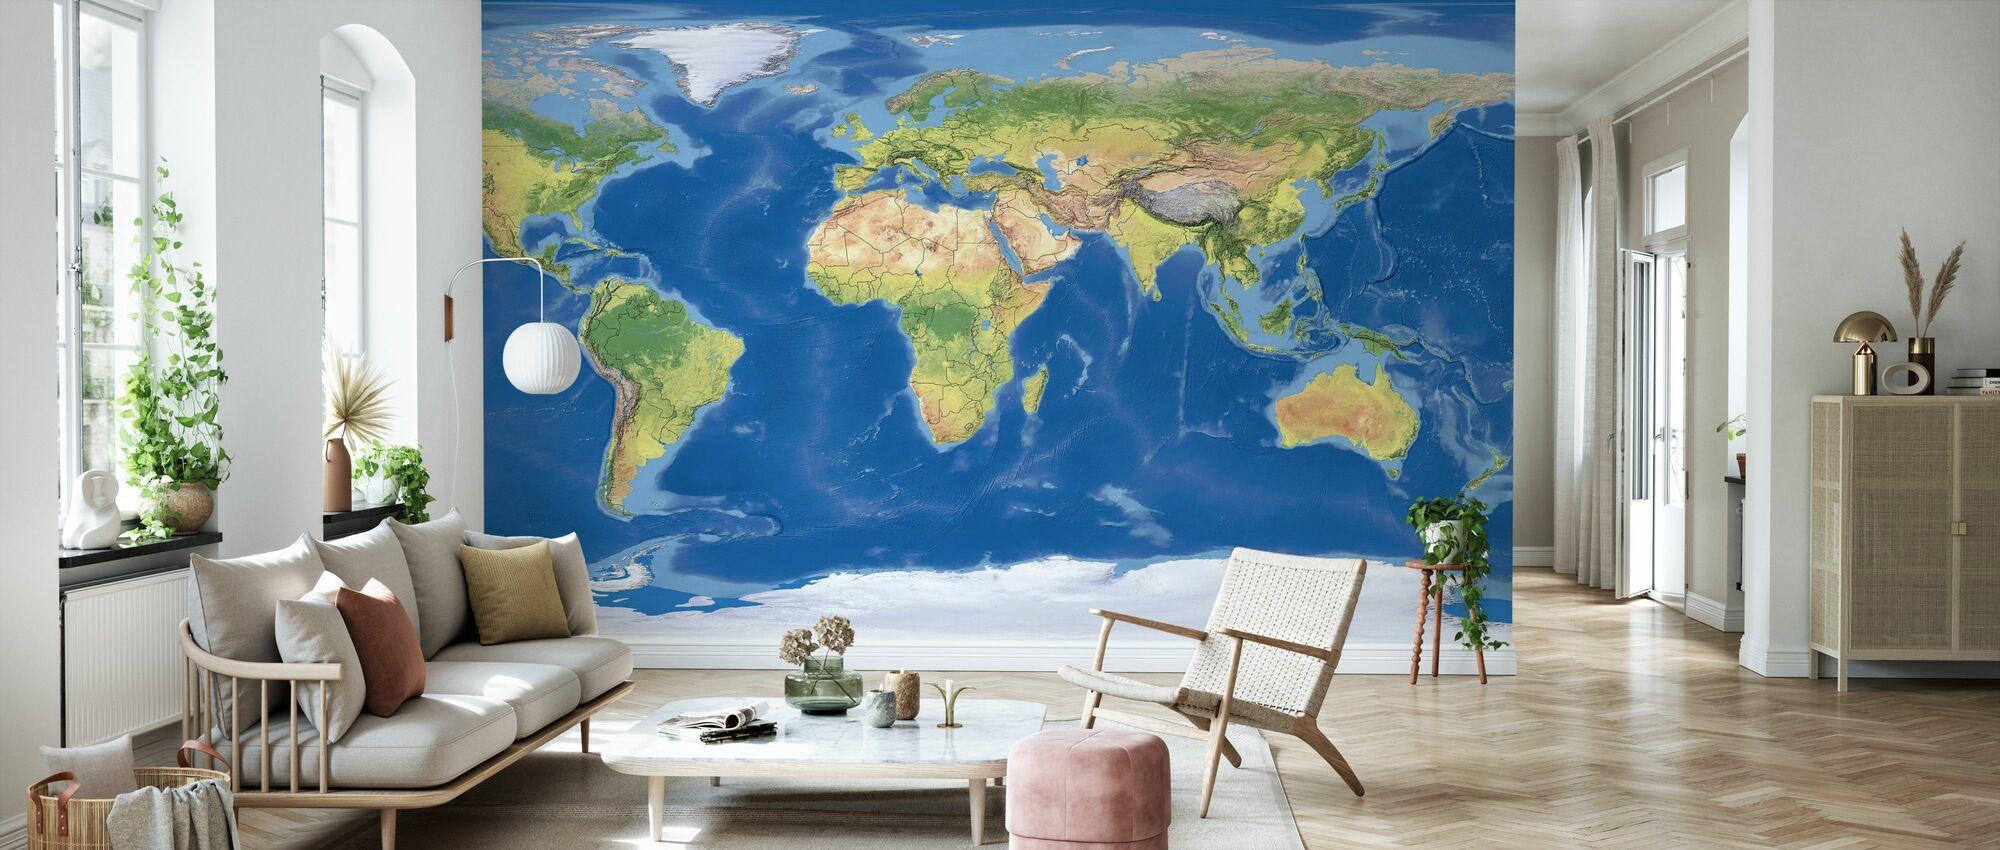 Topographic Map - Wallpaper - Living Room